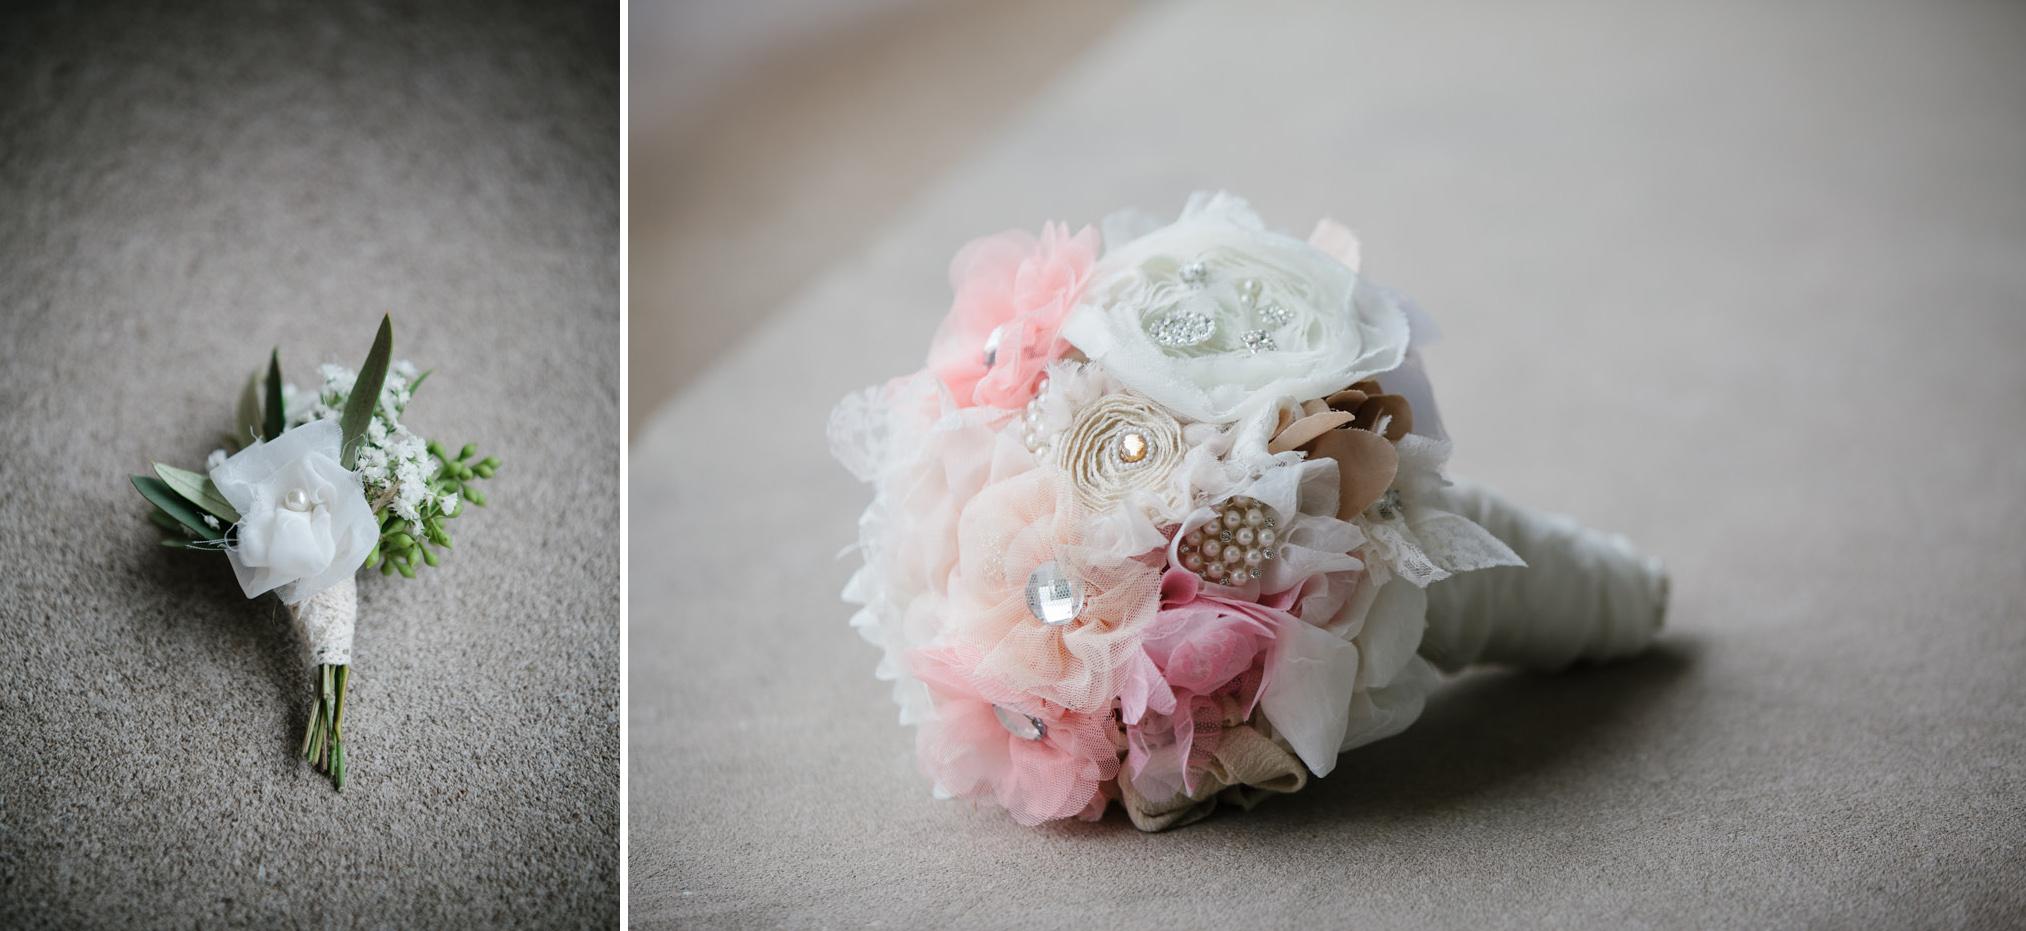 St-Louis-Wedding-Photography-1021-copy.jpg